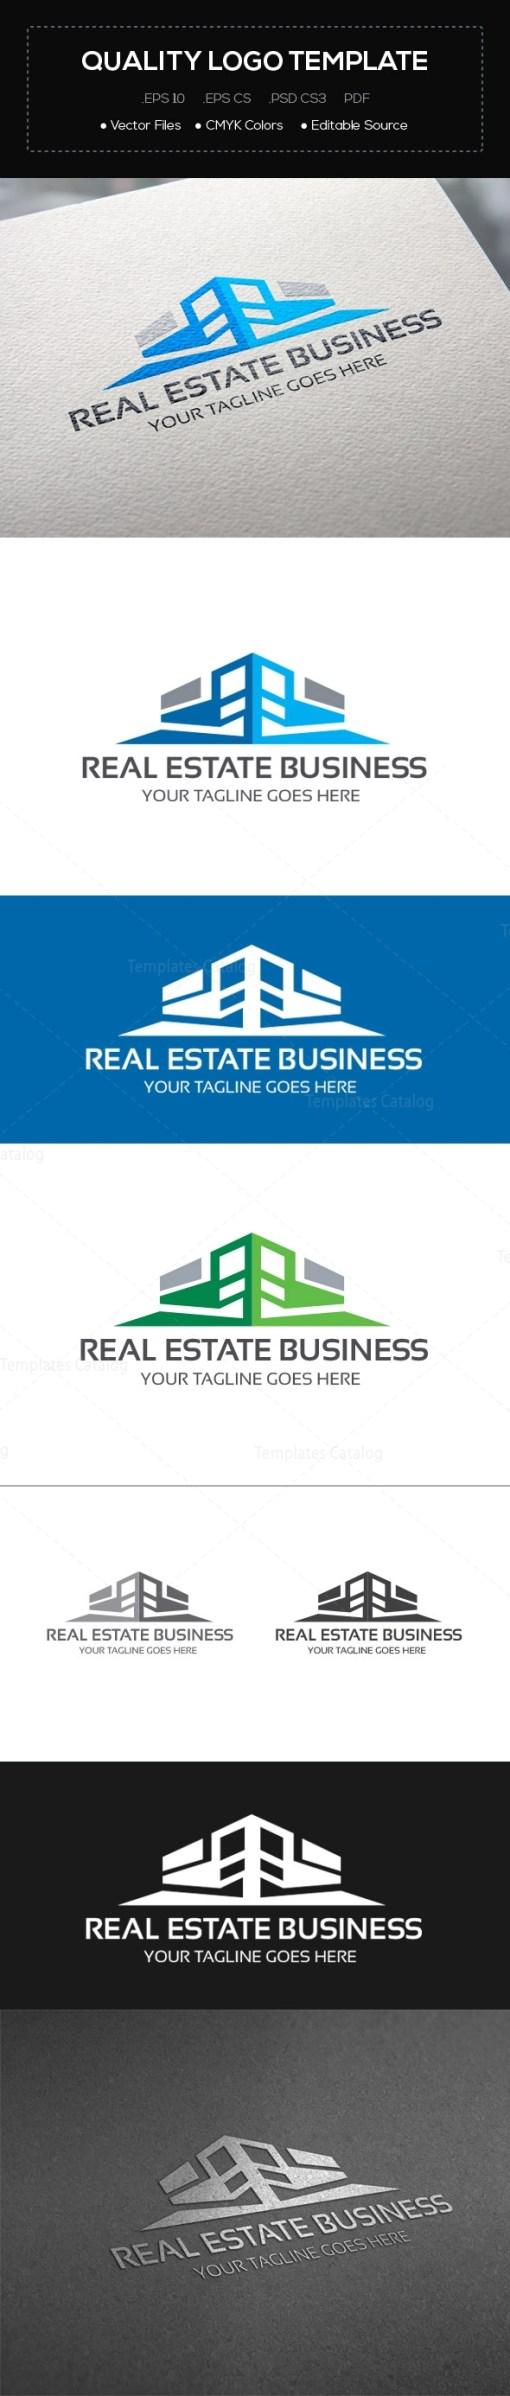 Real Estate Company Logo Template